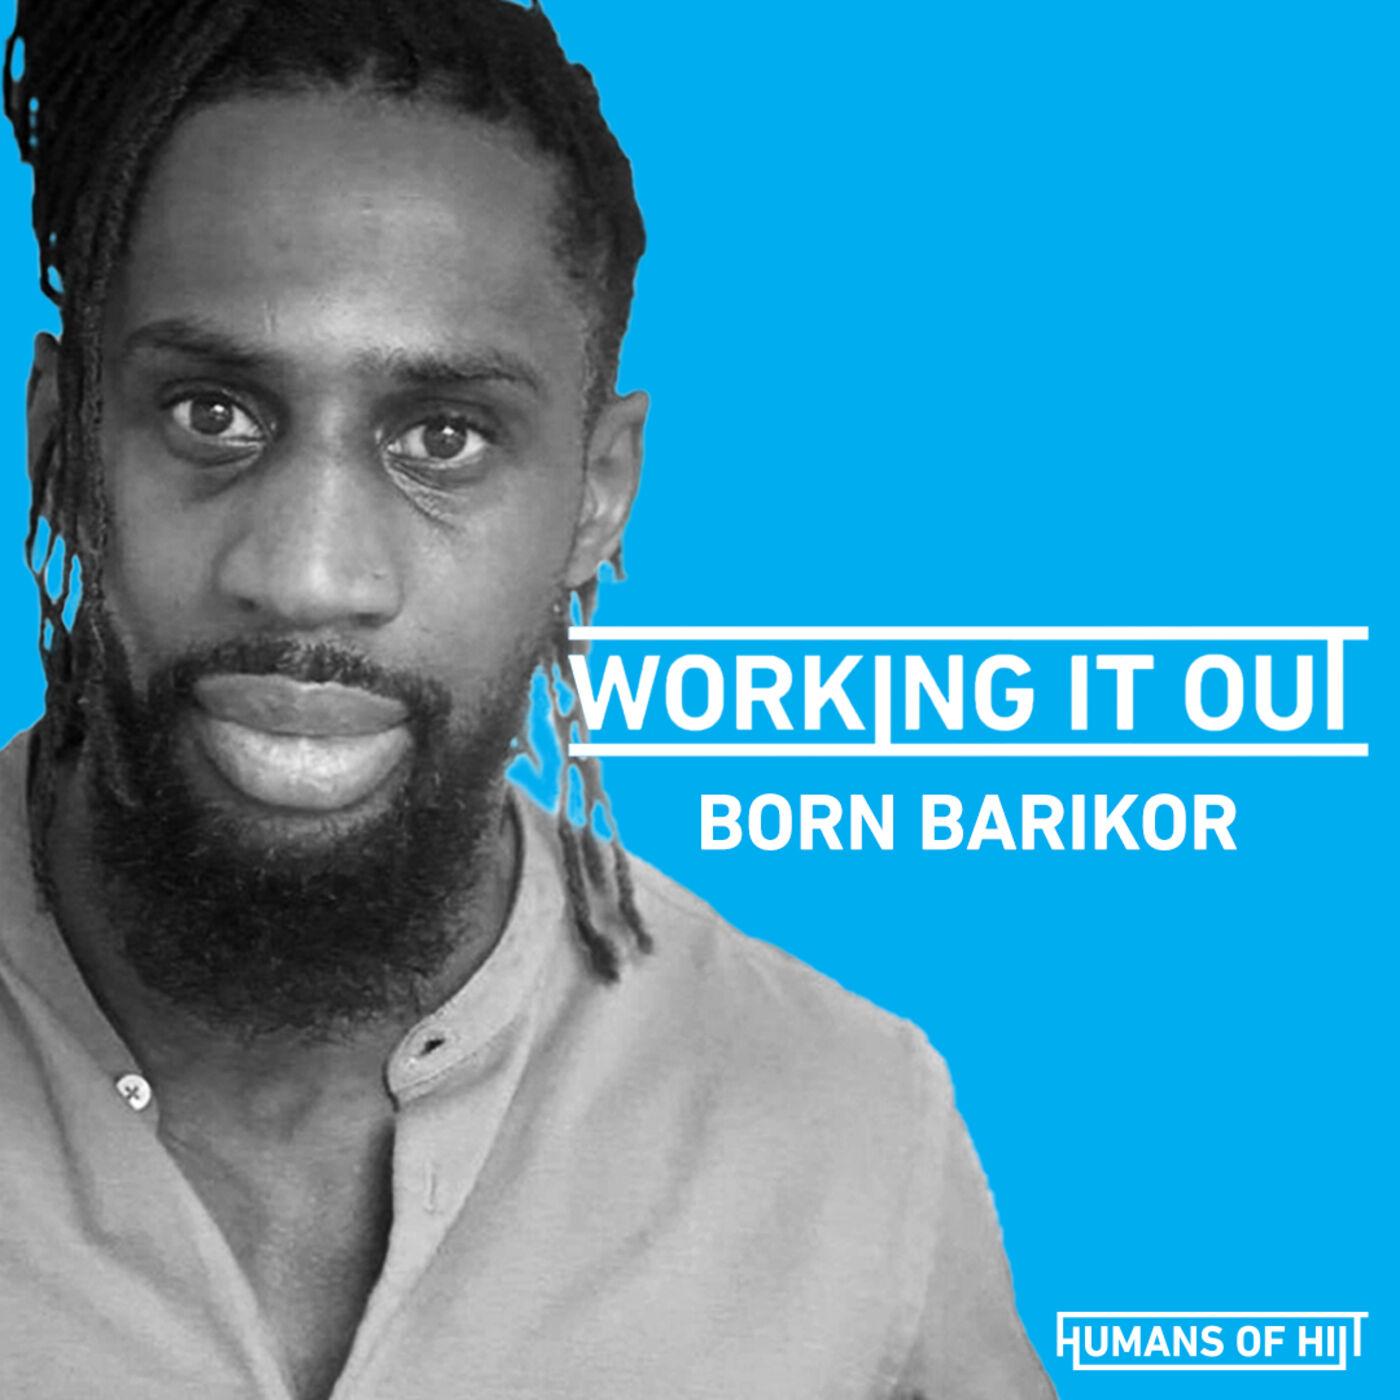 Episode 2 - Born Barikor